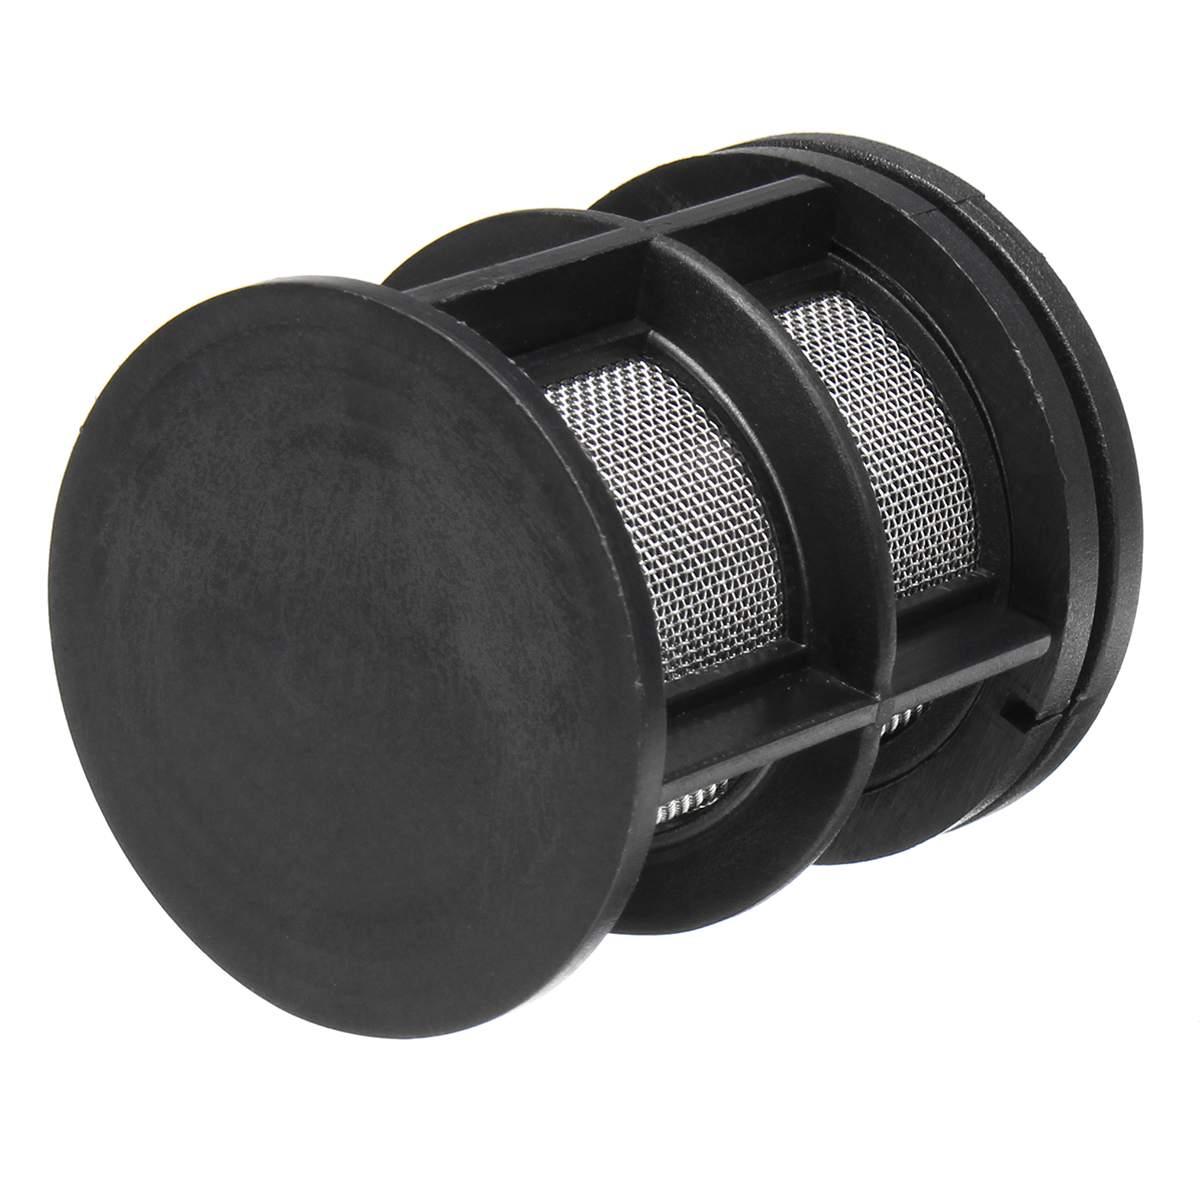 25mm Air Filter Silencer Black Plastic For Webasto Eberspacher Auto Heater